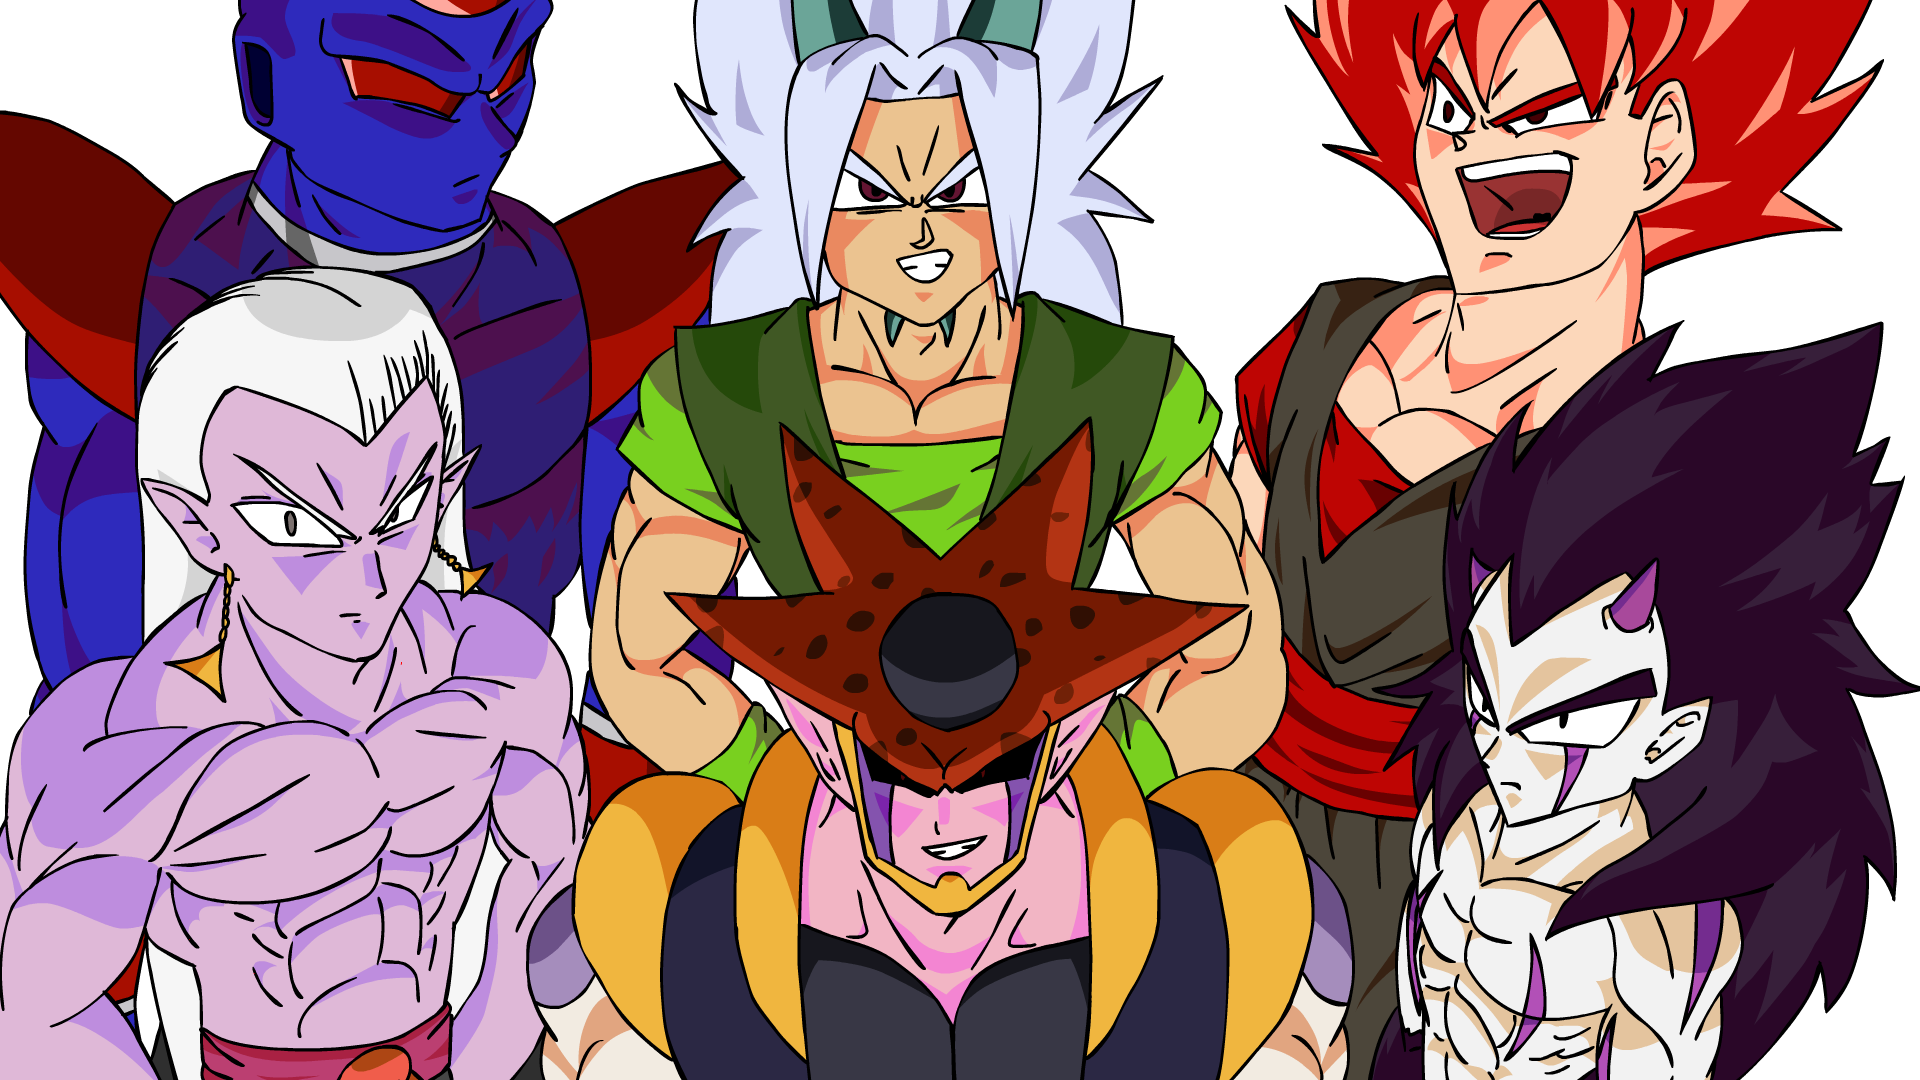 Villanos De Dragon Ball Af Historia Completa By Khddutfkifu On Deviantart